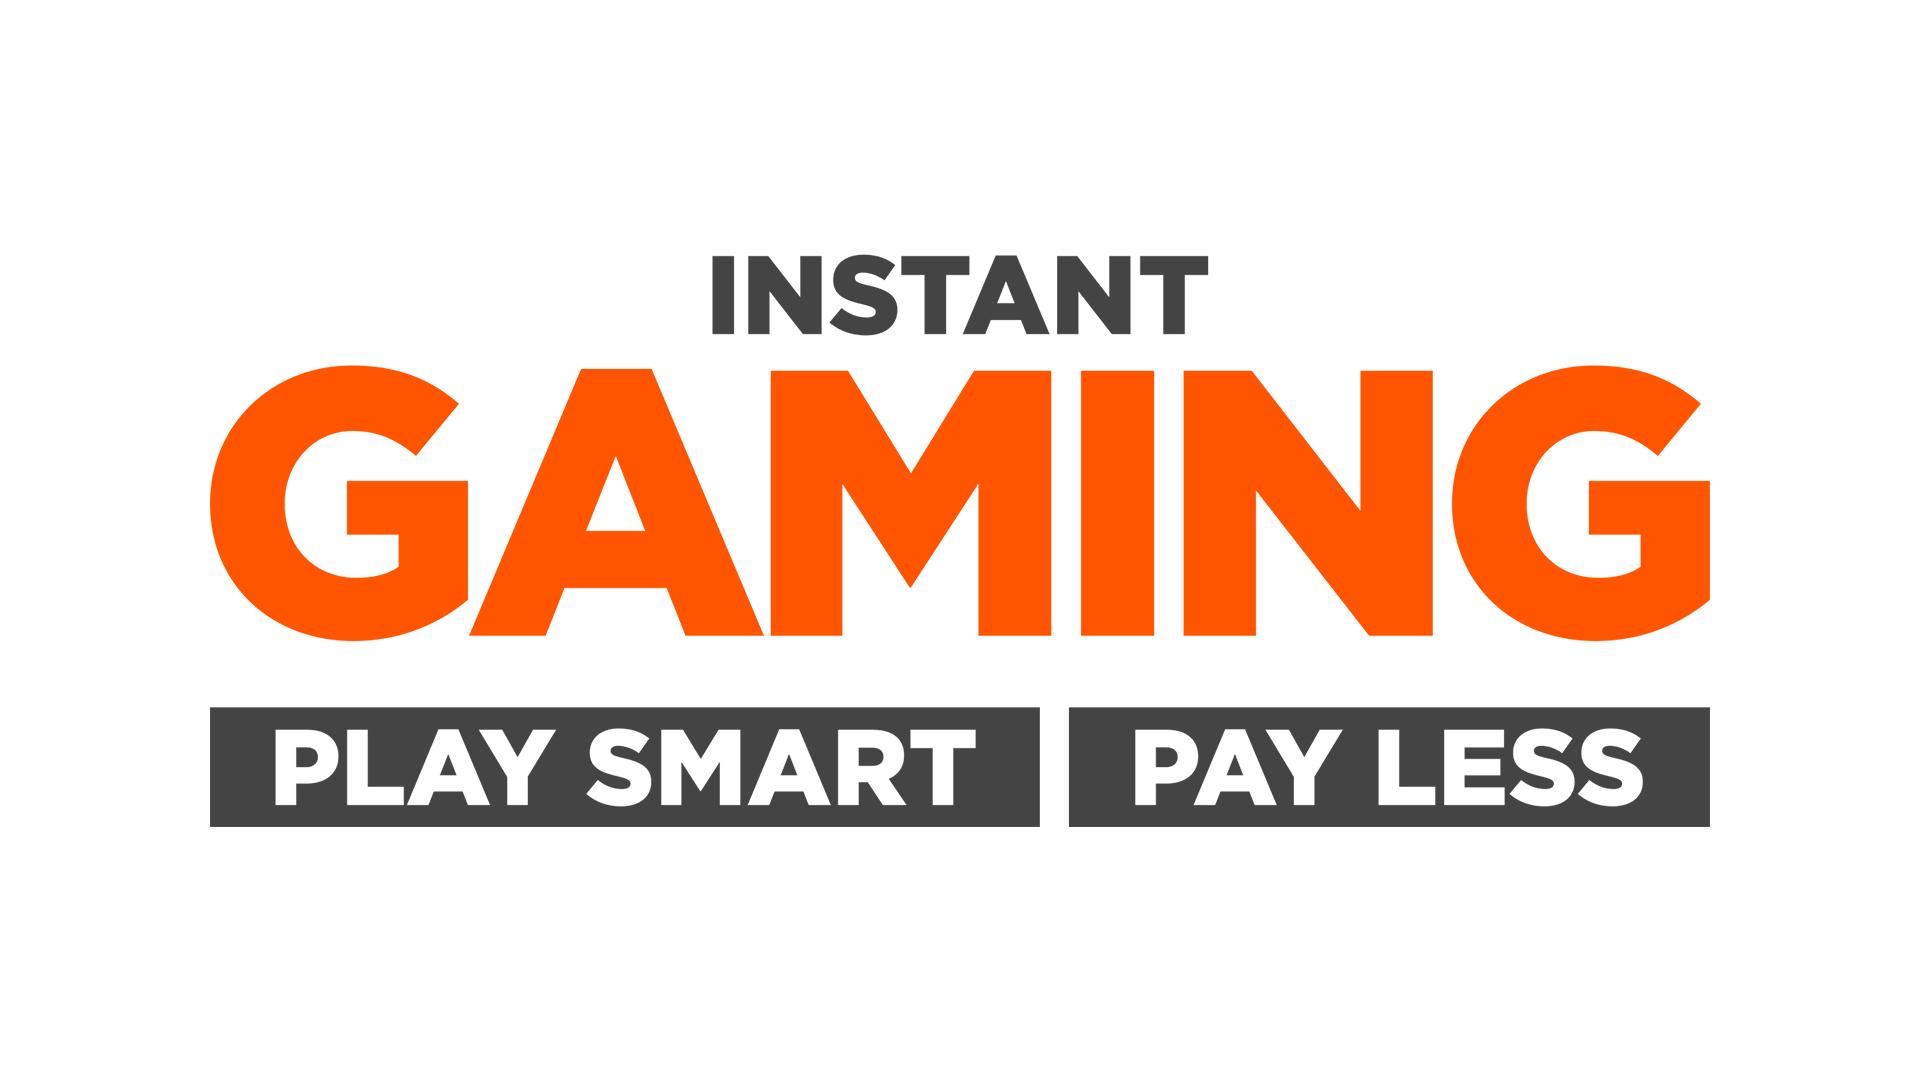 Instand Gaming Logo - Haton.net